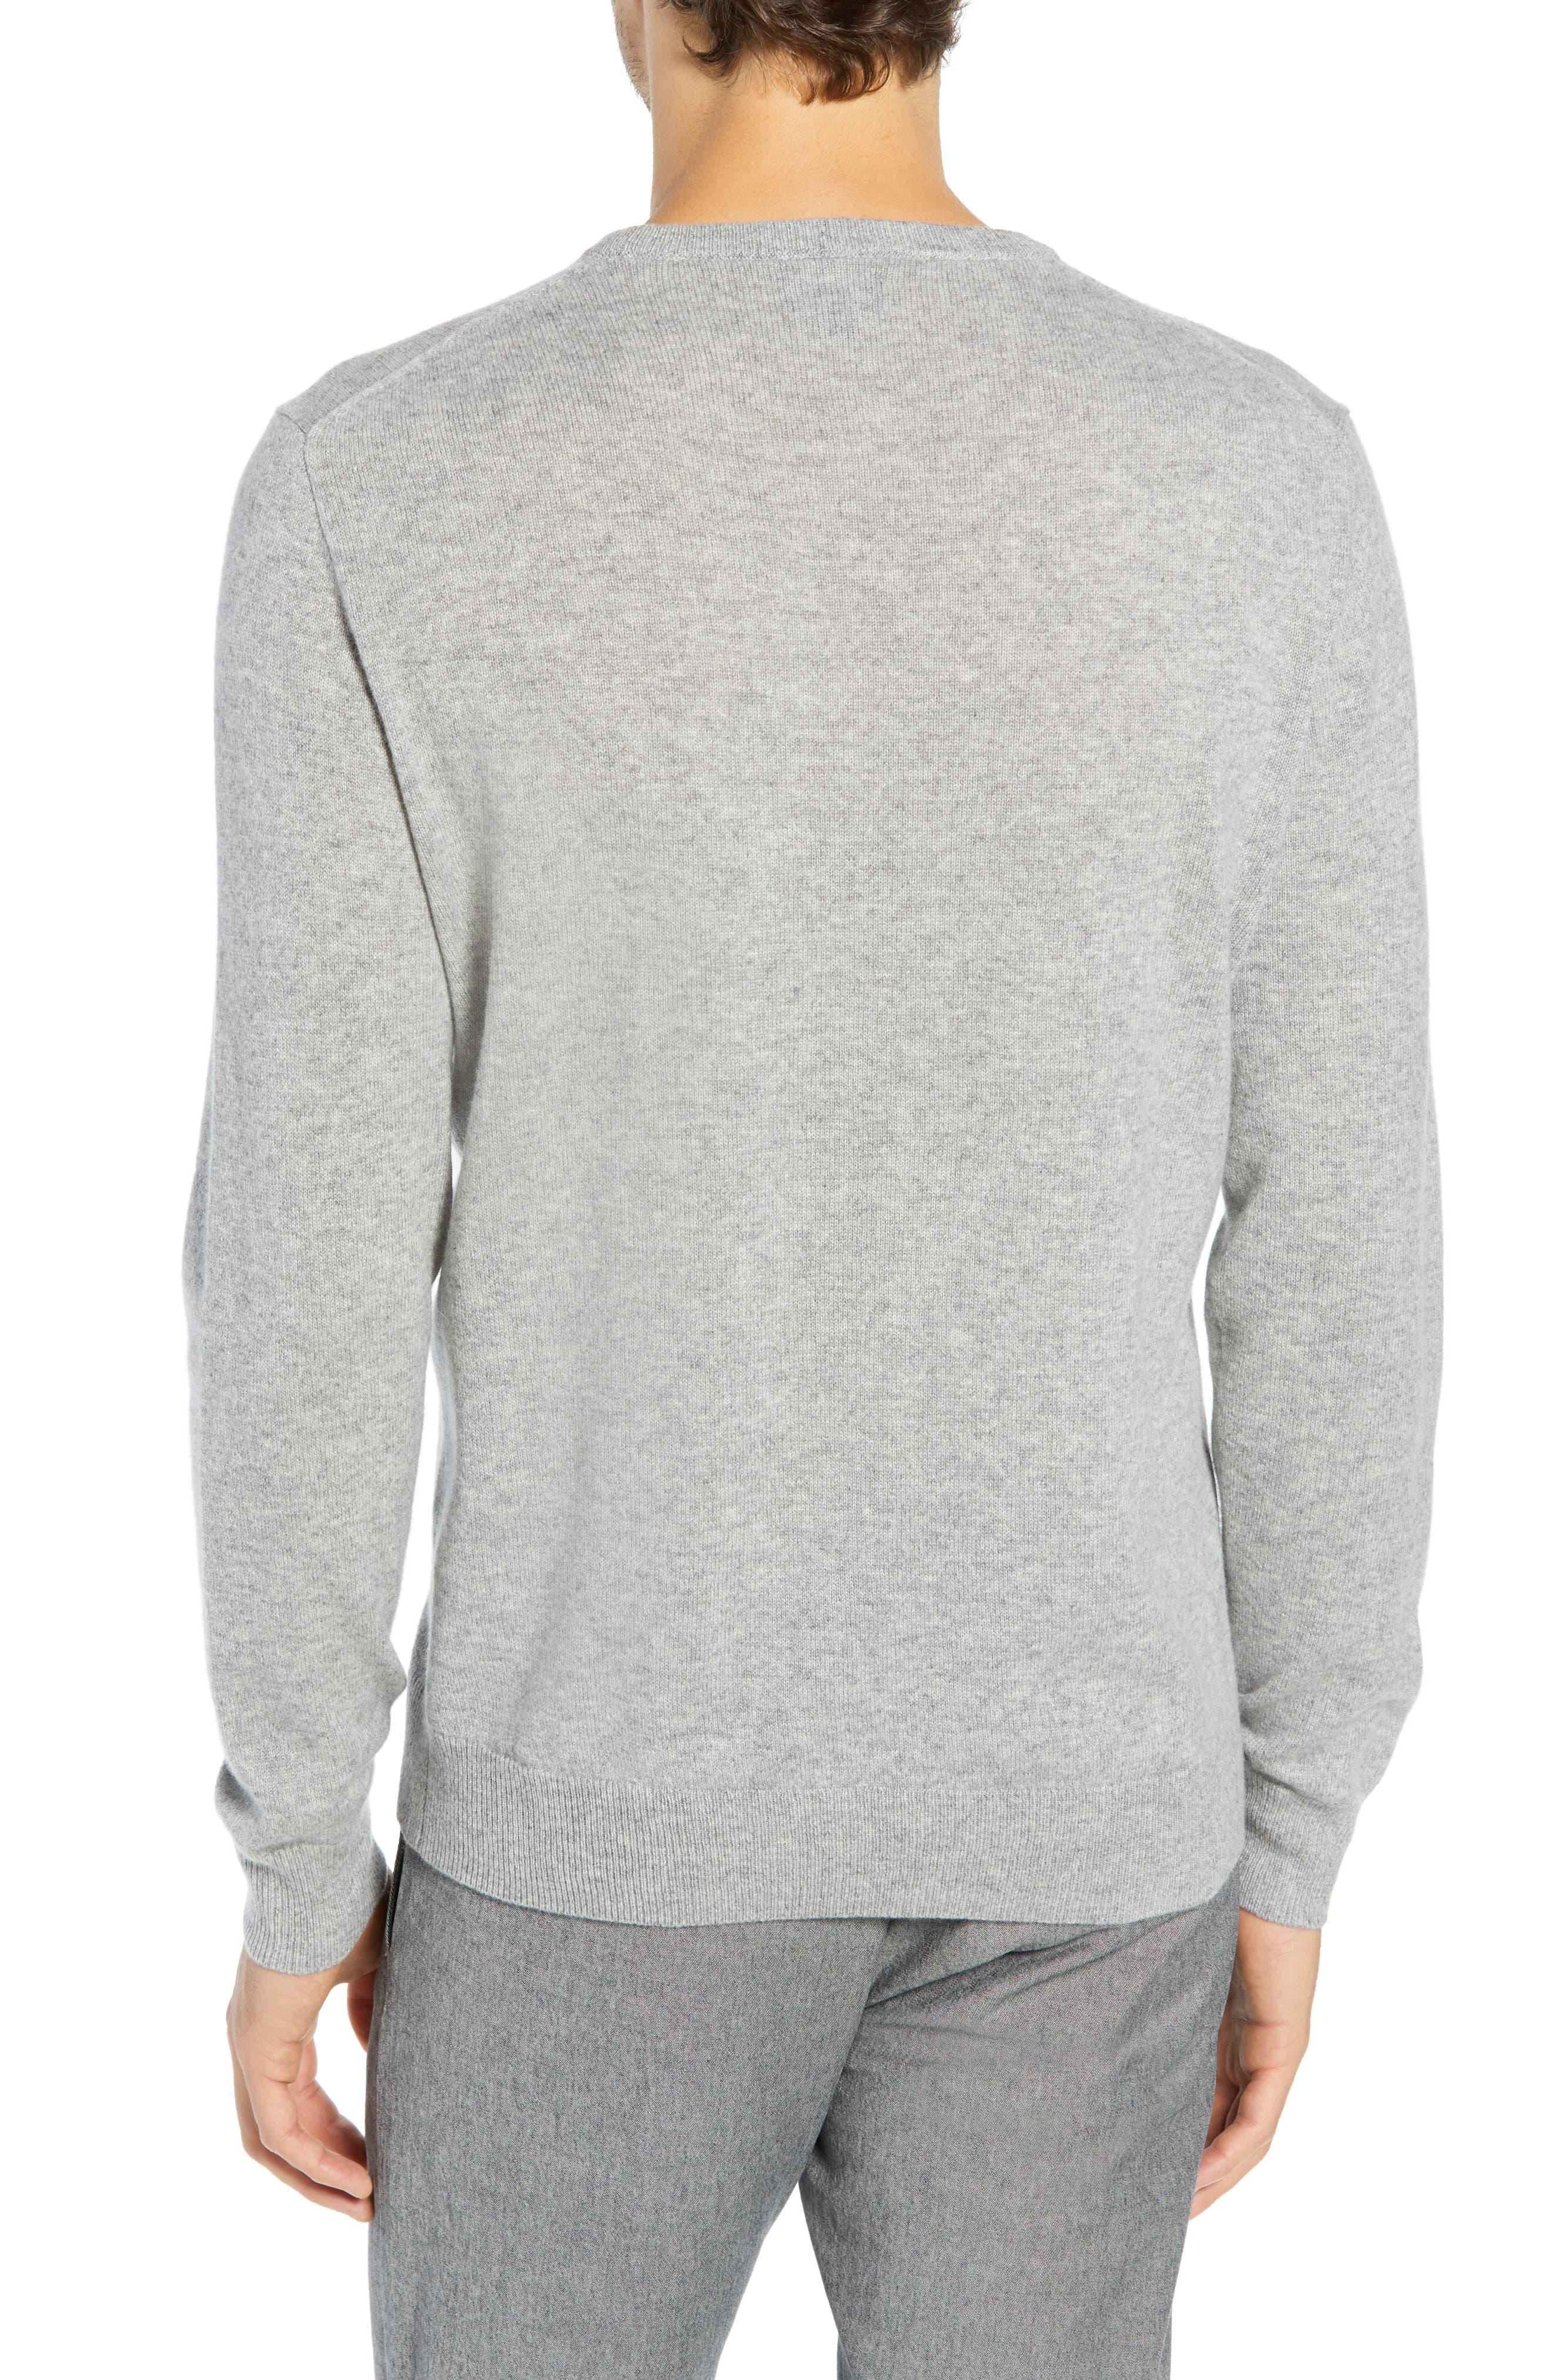 Everyday Cashmere Regular Fit Crewneck Sweater,                             Alternate thumbnail 2, color,                             HEATHER GREY